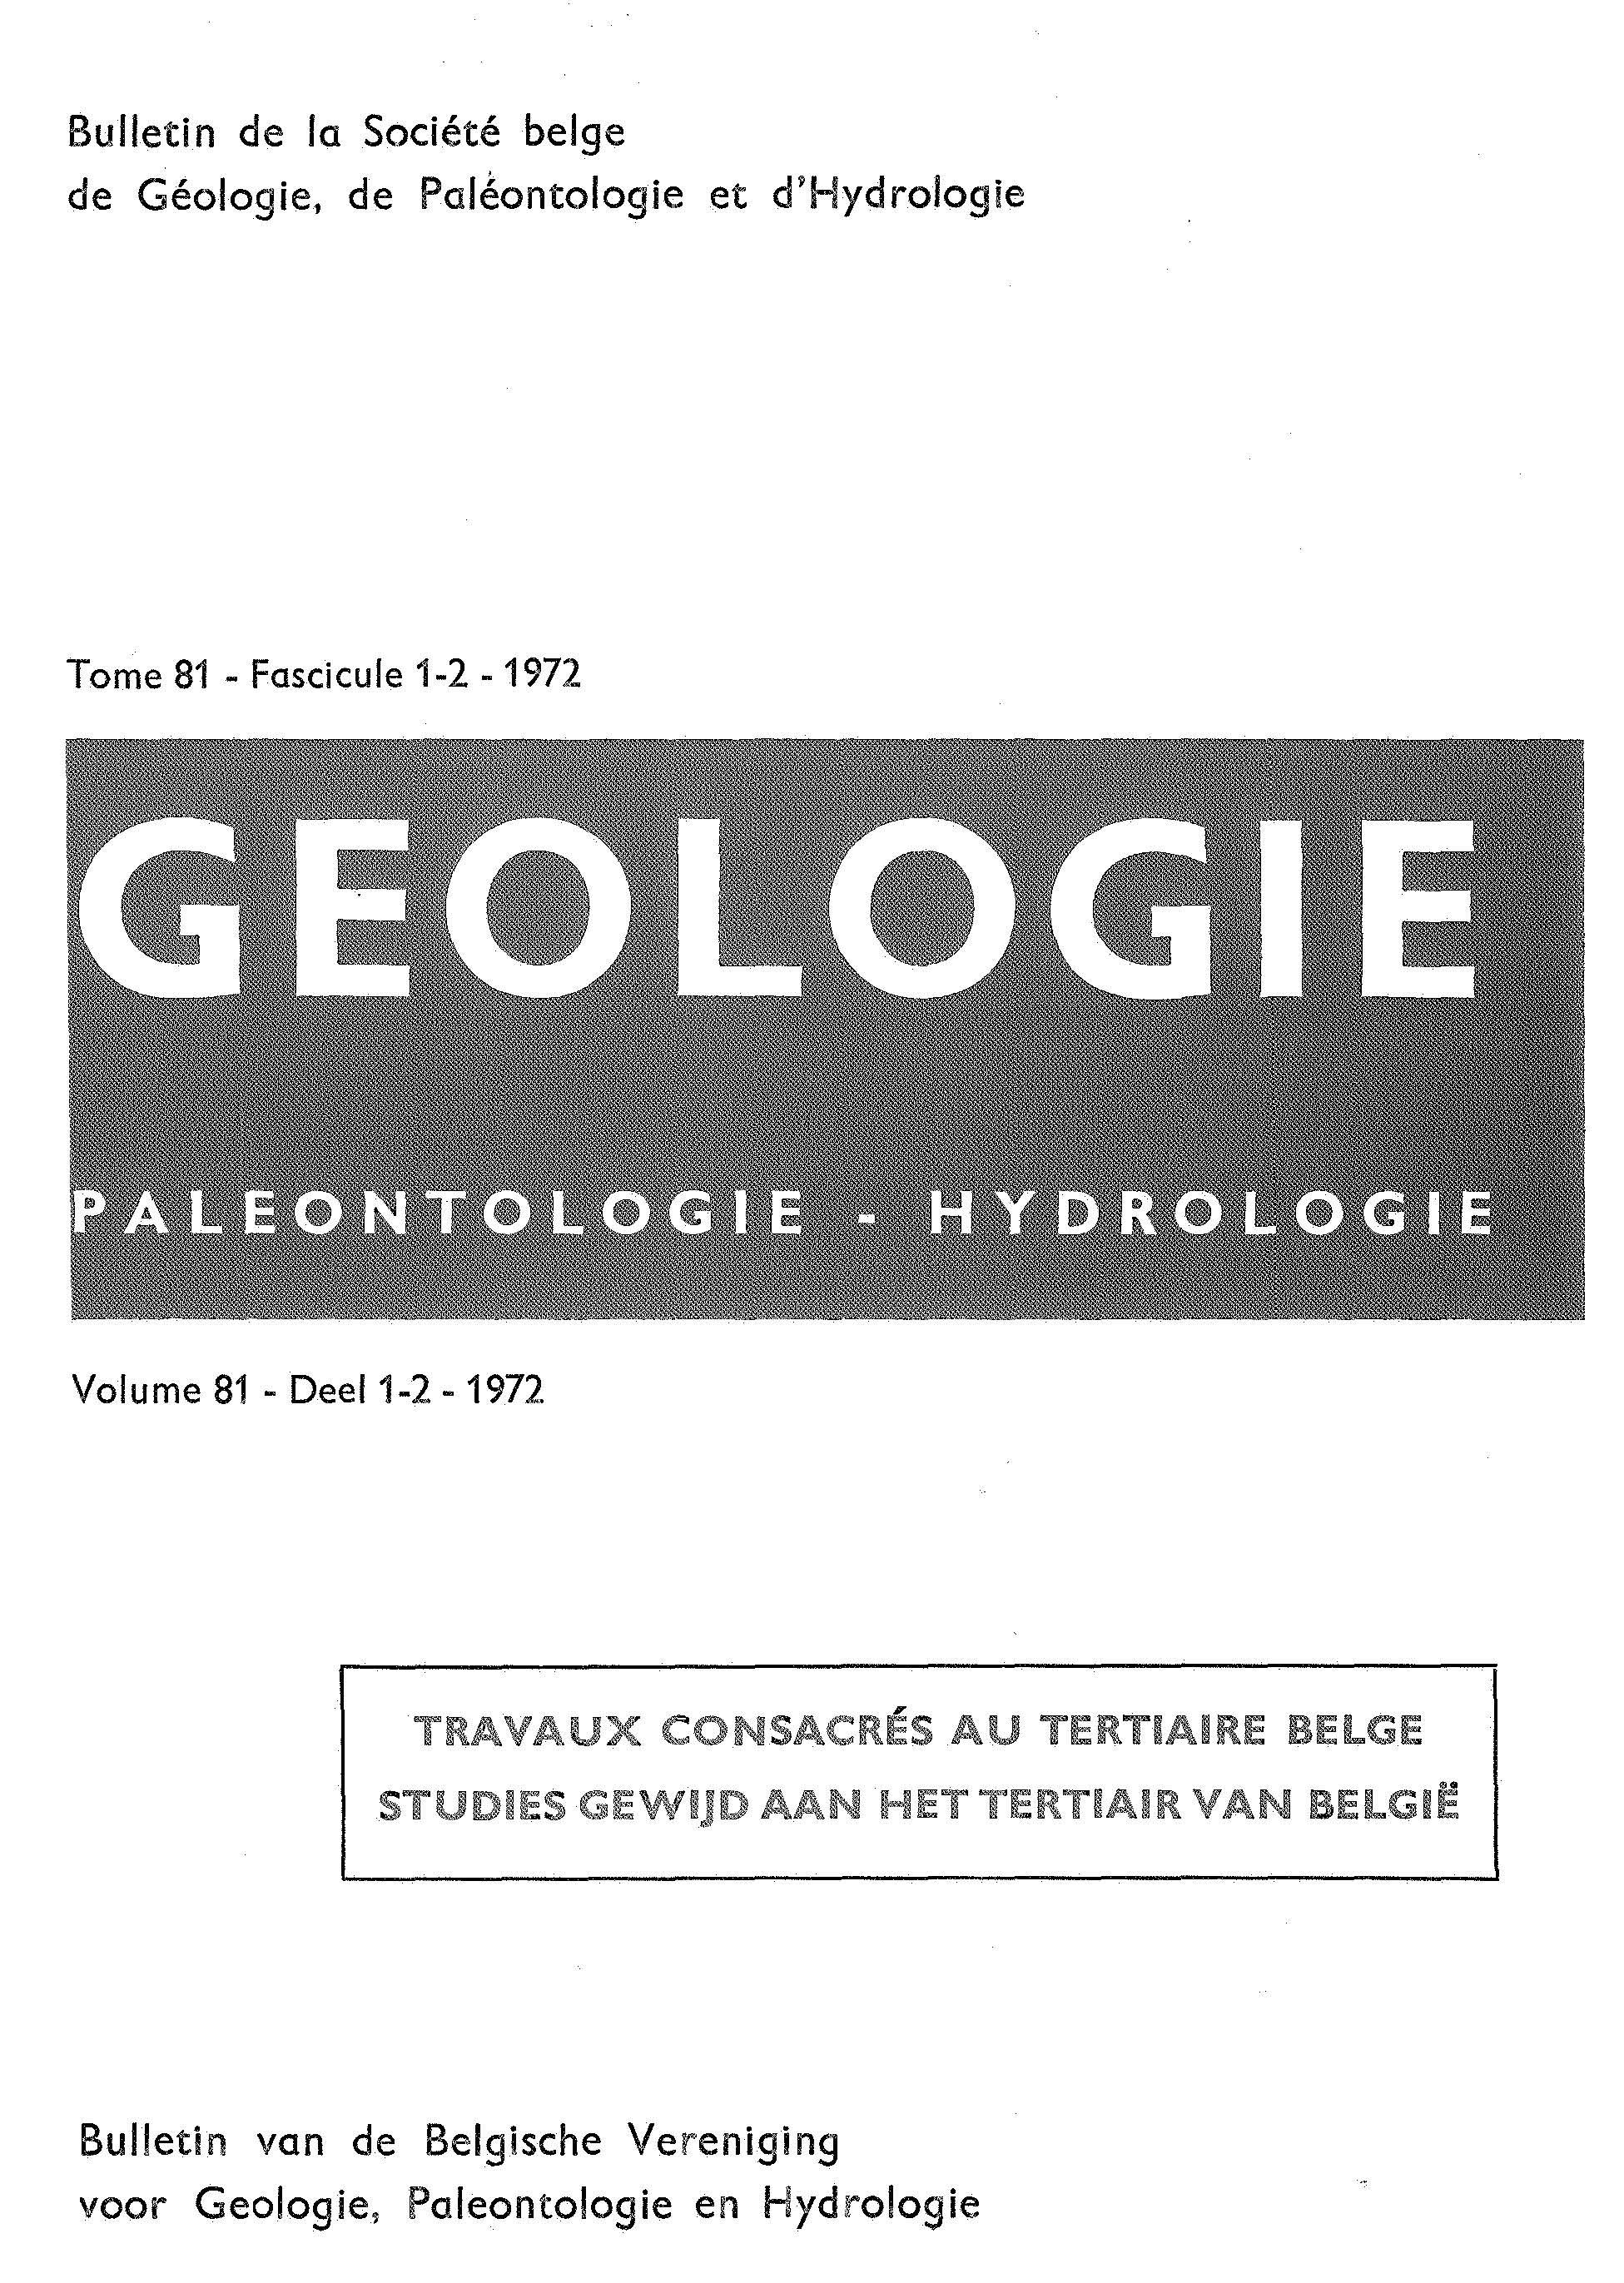 BSBG_81_1972_cover1.jpg